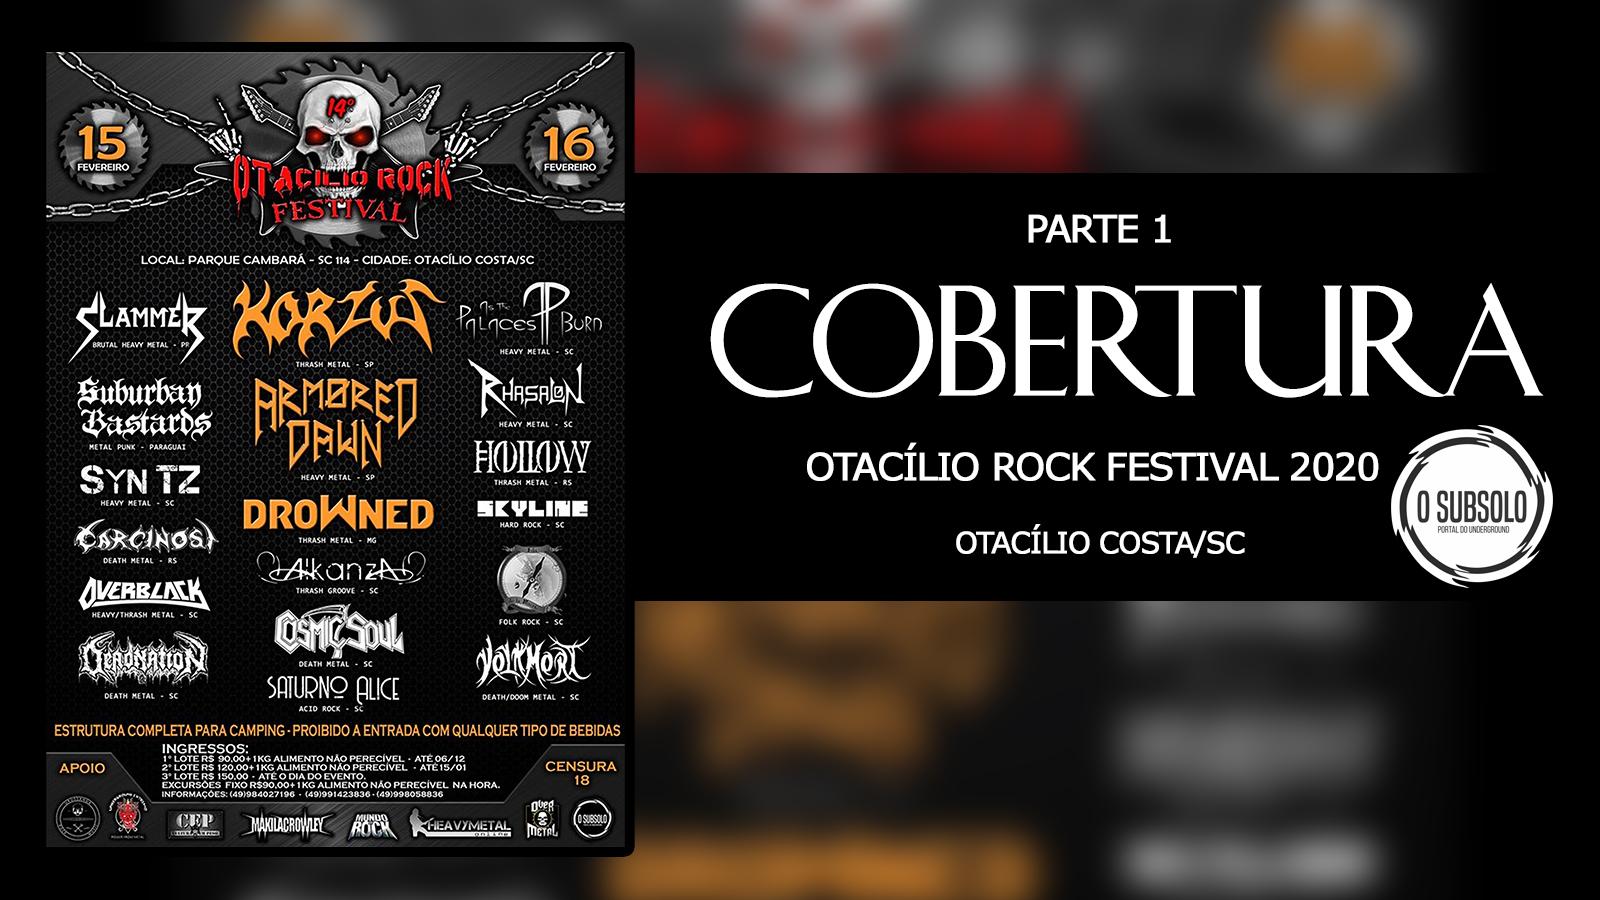 O SUBSOLO   COBERTURA   14º OTACÍLIO ROCK FESTIVAL 2020